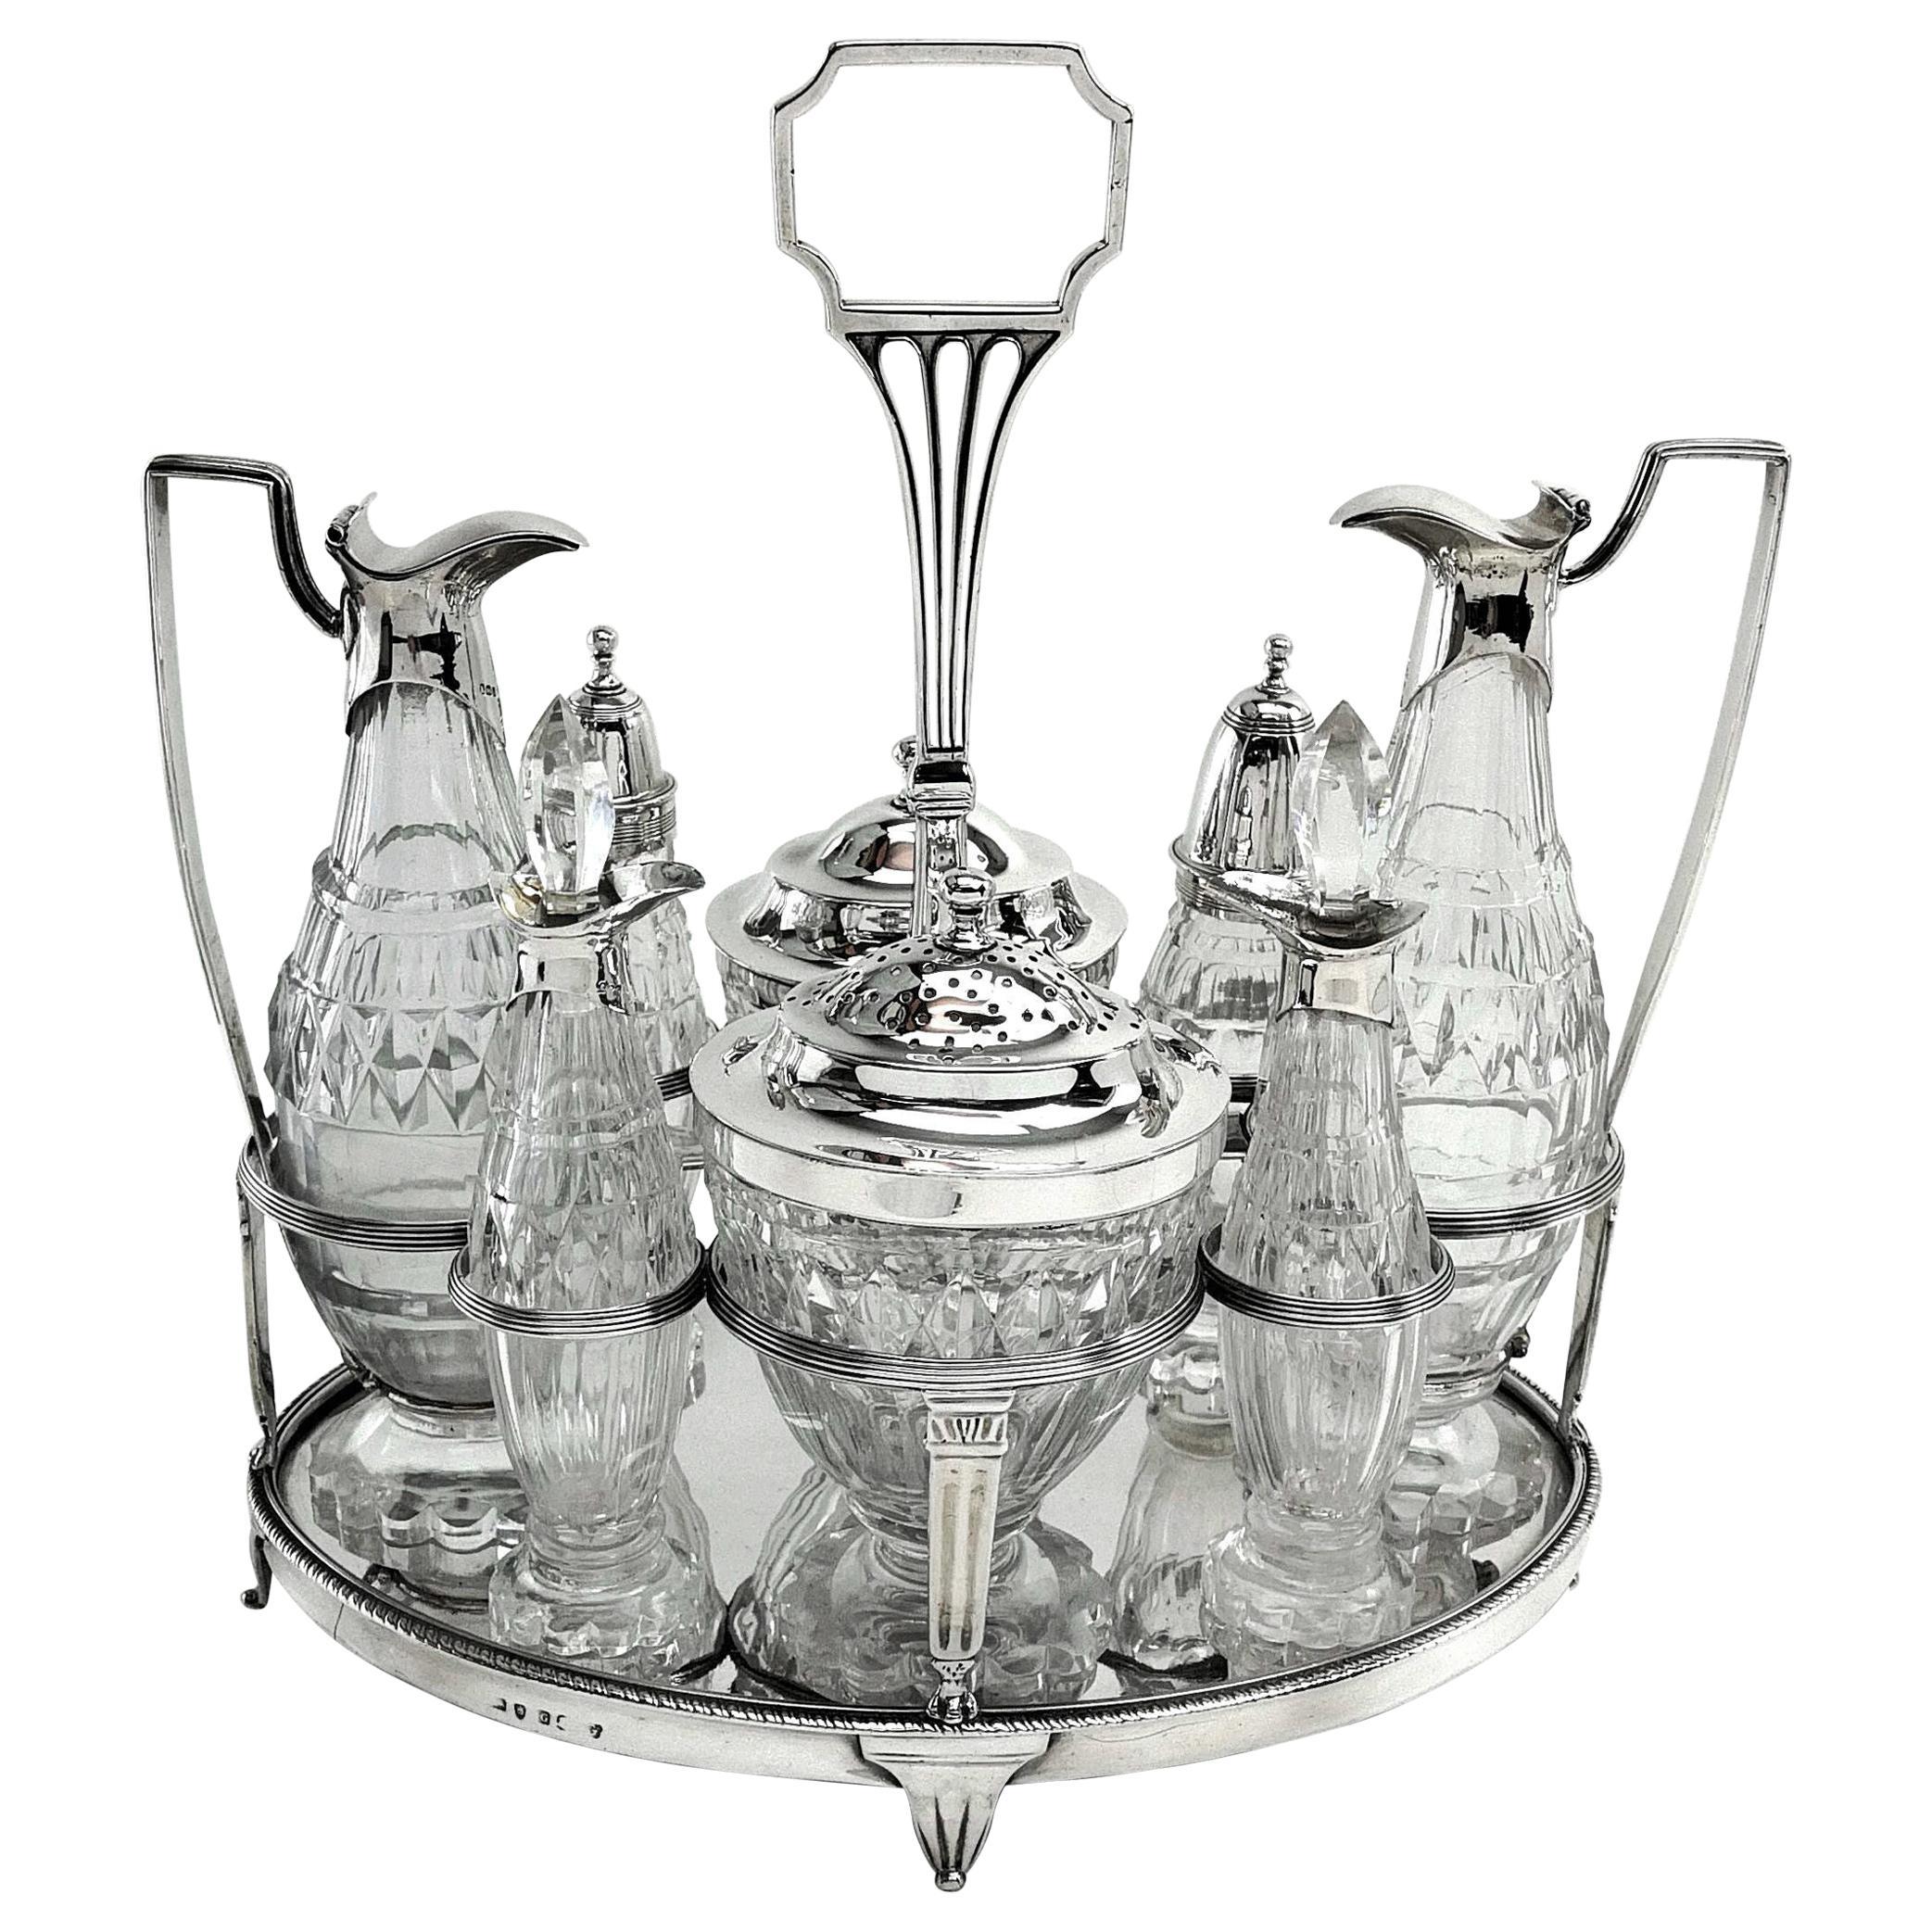 Antique Georgian George III Cruet Set / Condiment Stand 1802